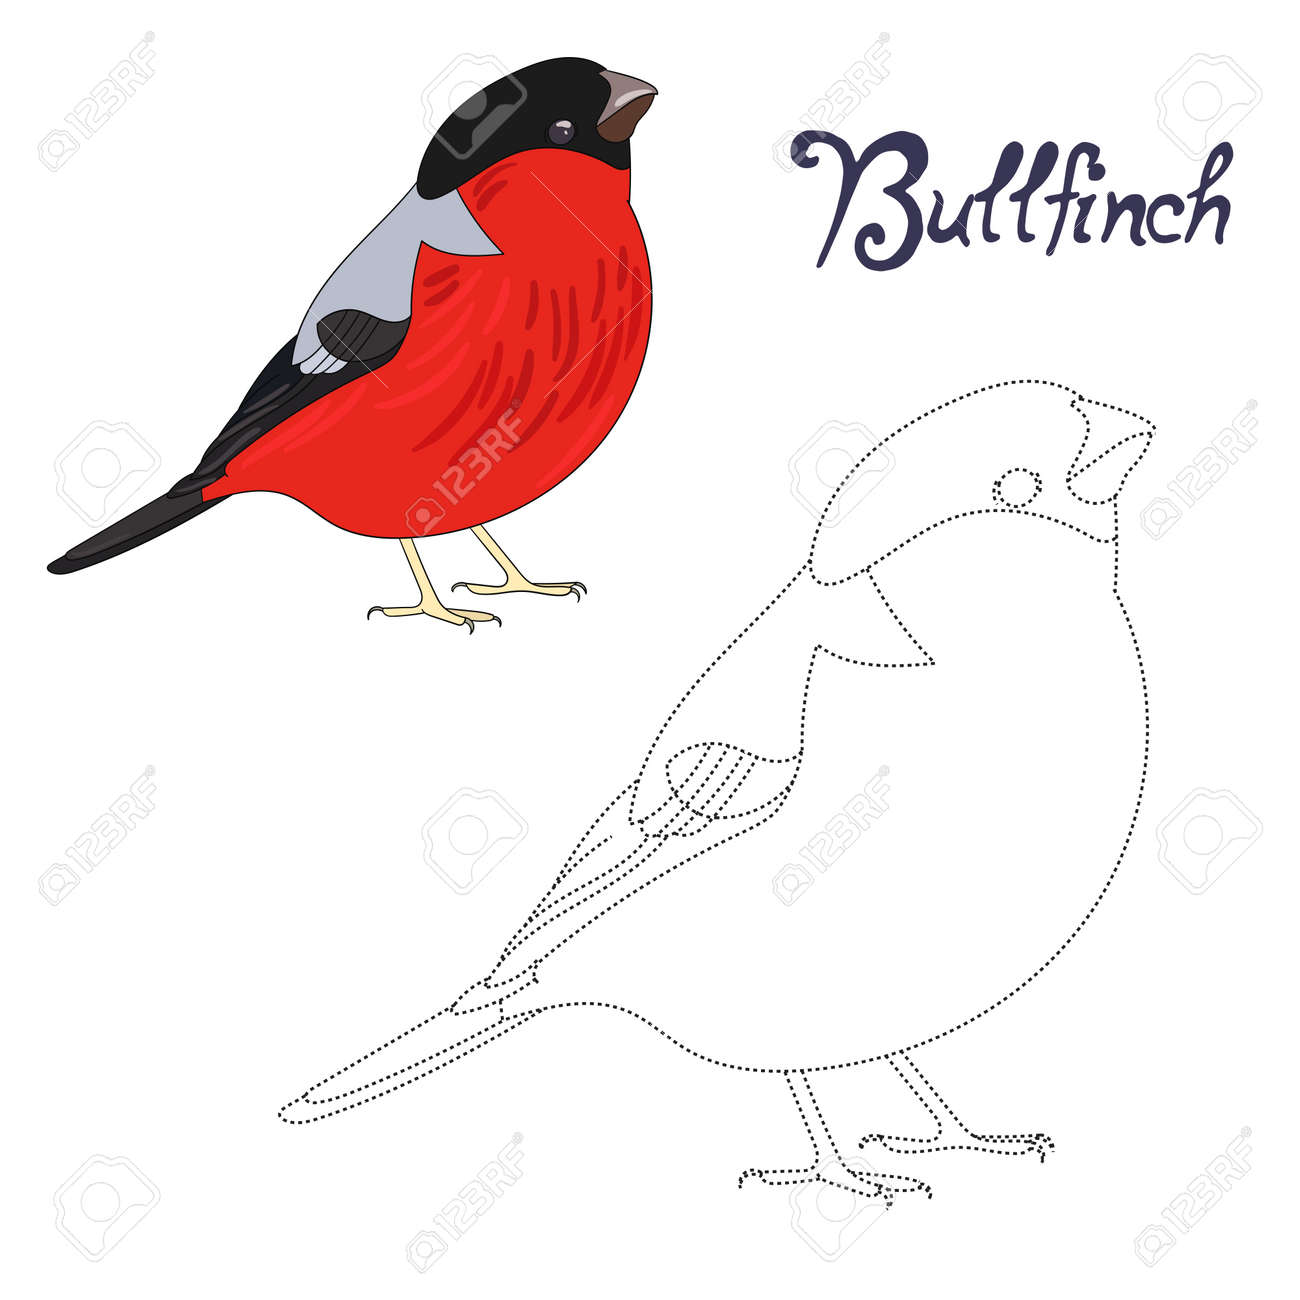 educational game connect the dots to draw bullfinch bird cartoon